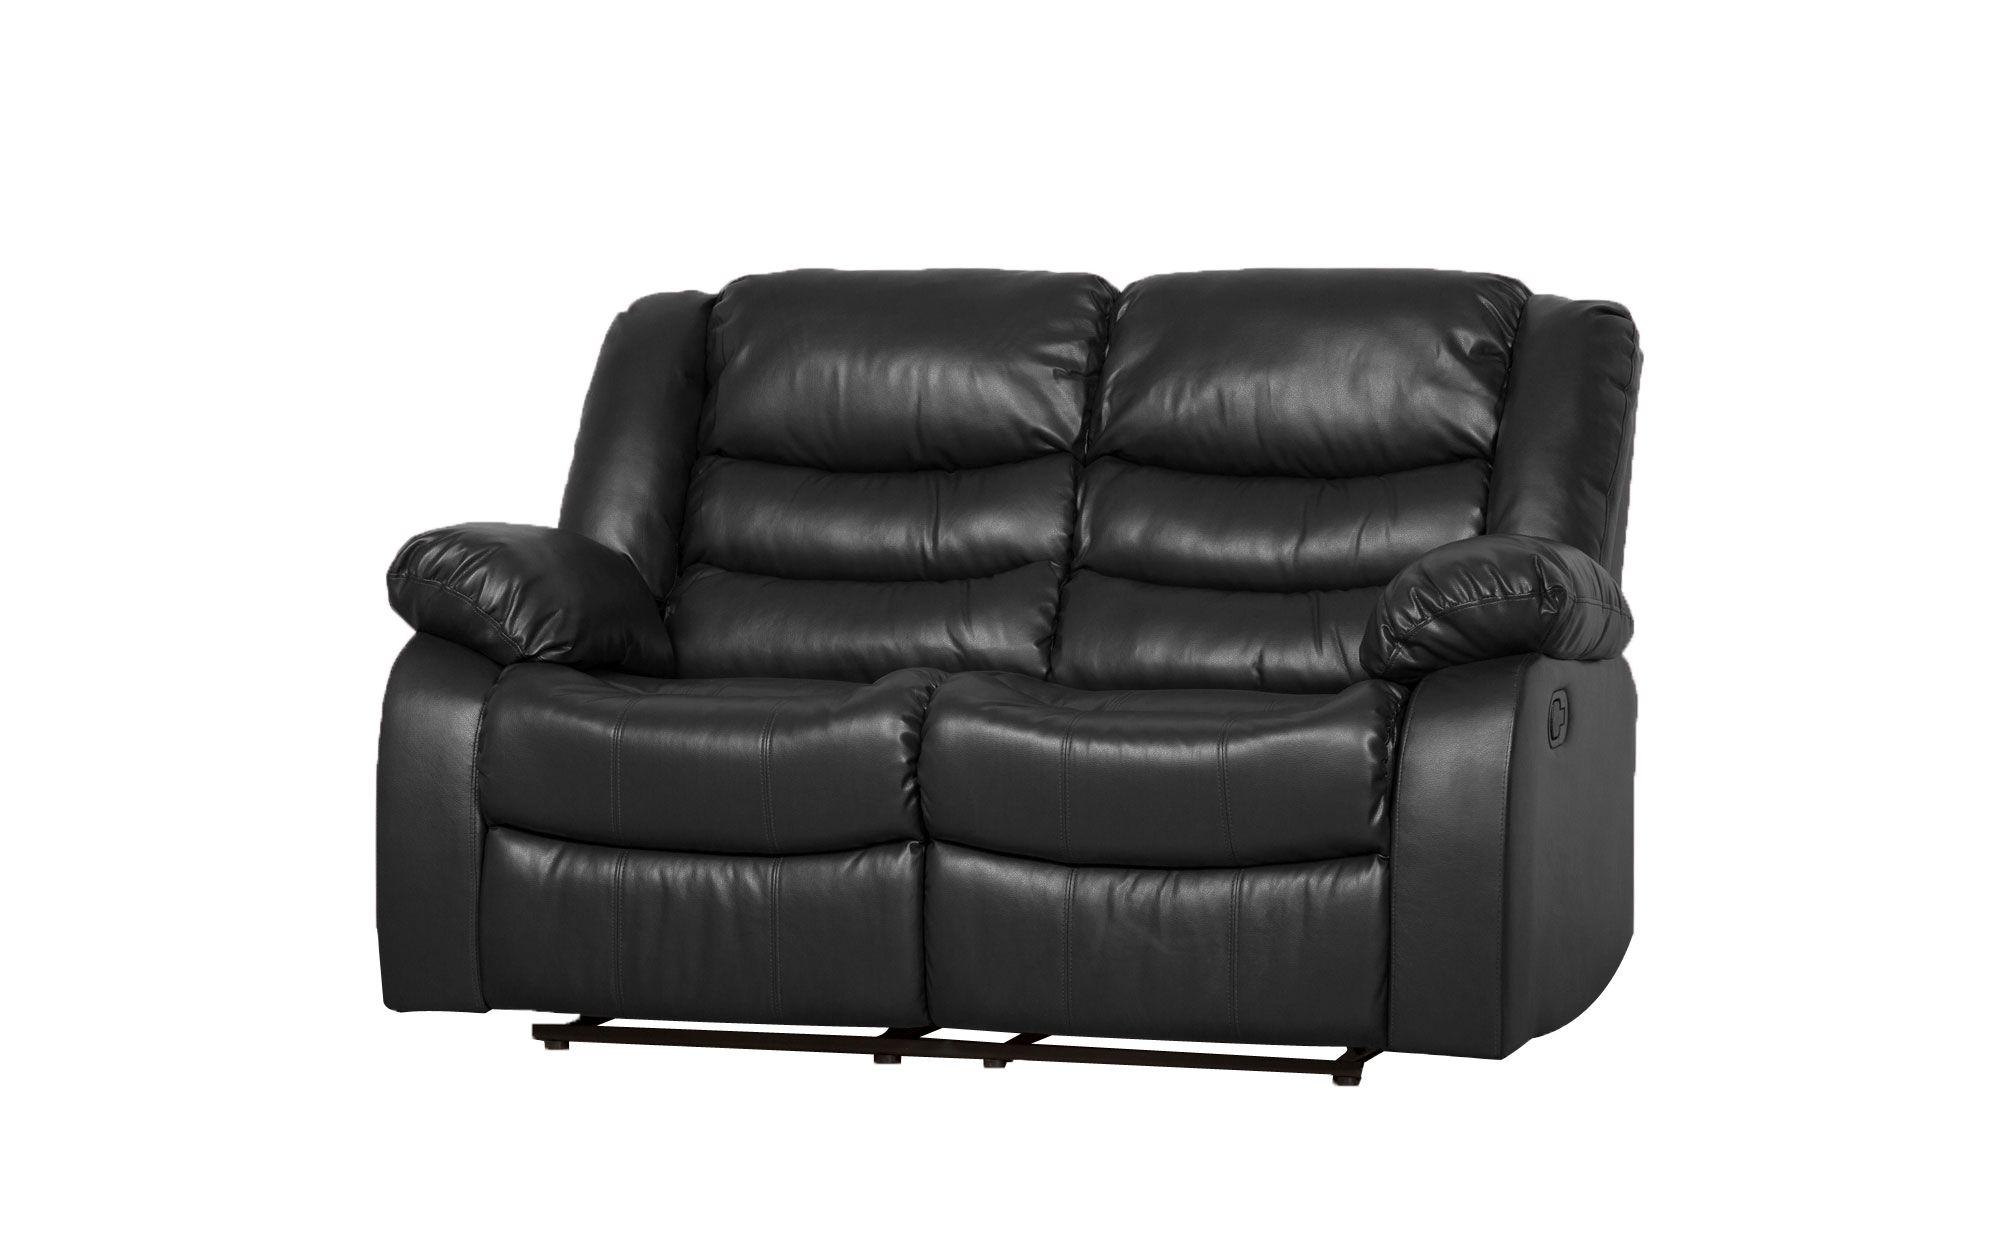 Sorrento Black Leather 2 Seater Recliner Sofa Reclining Sofa Sofa Sofa Furniture